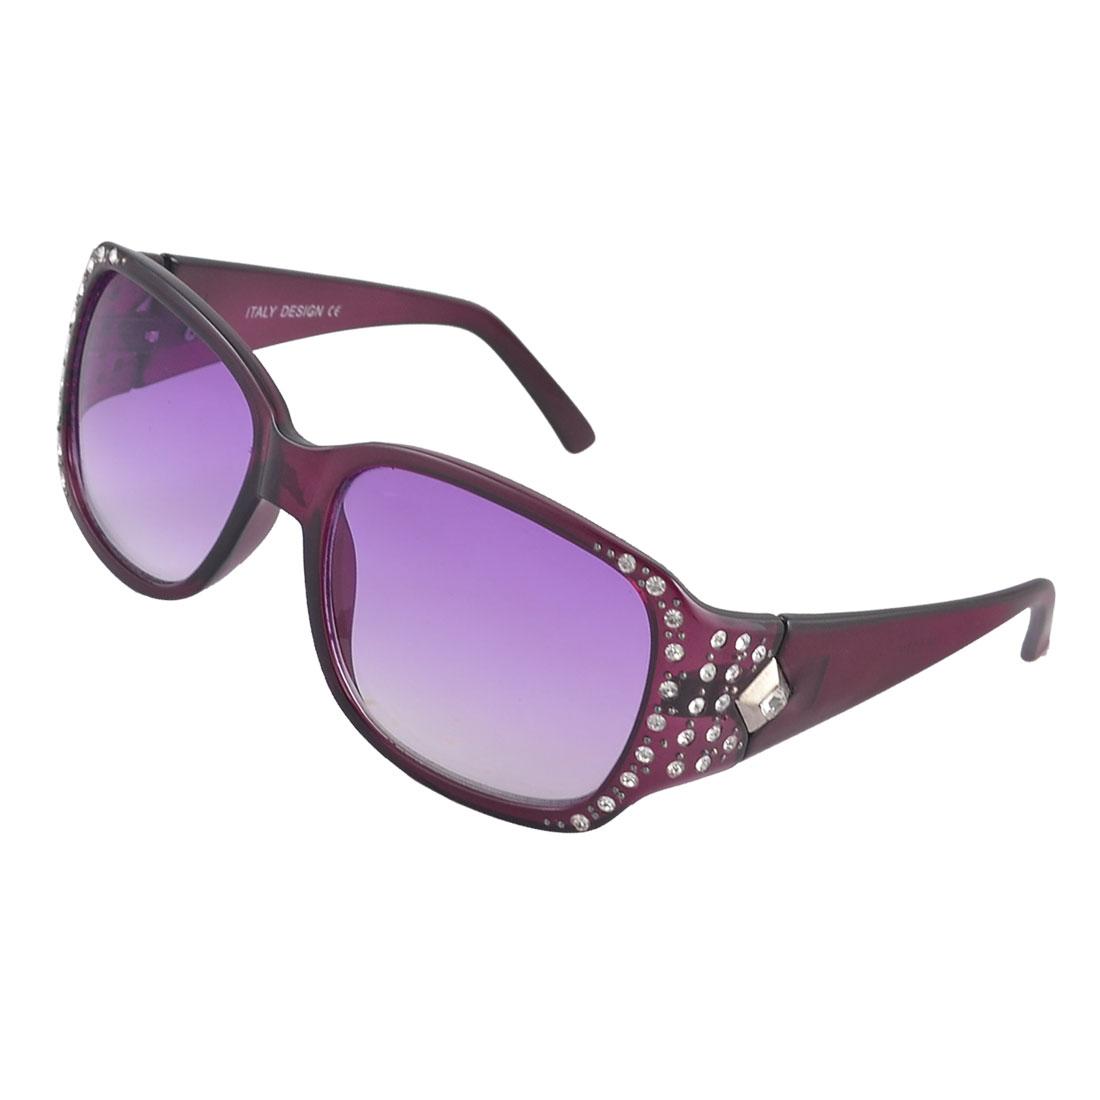 Lady Rhinestone Detail Purple Plastic Full Rim Rectangle Shape Lens Sunglasses